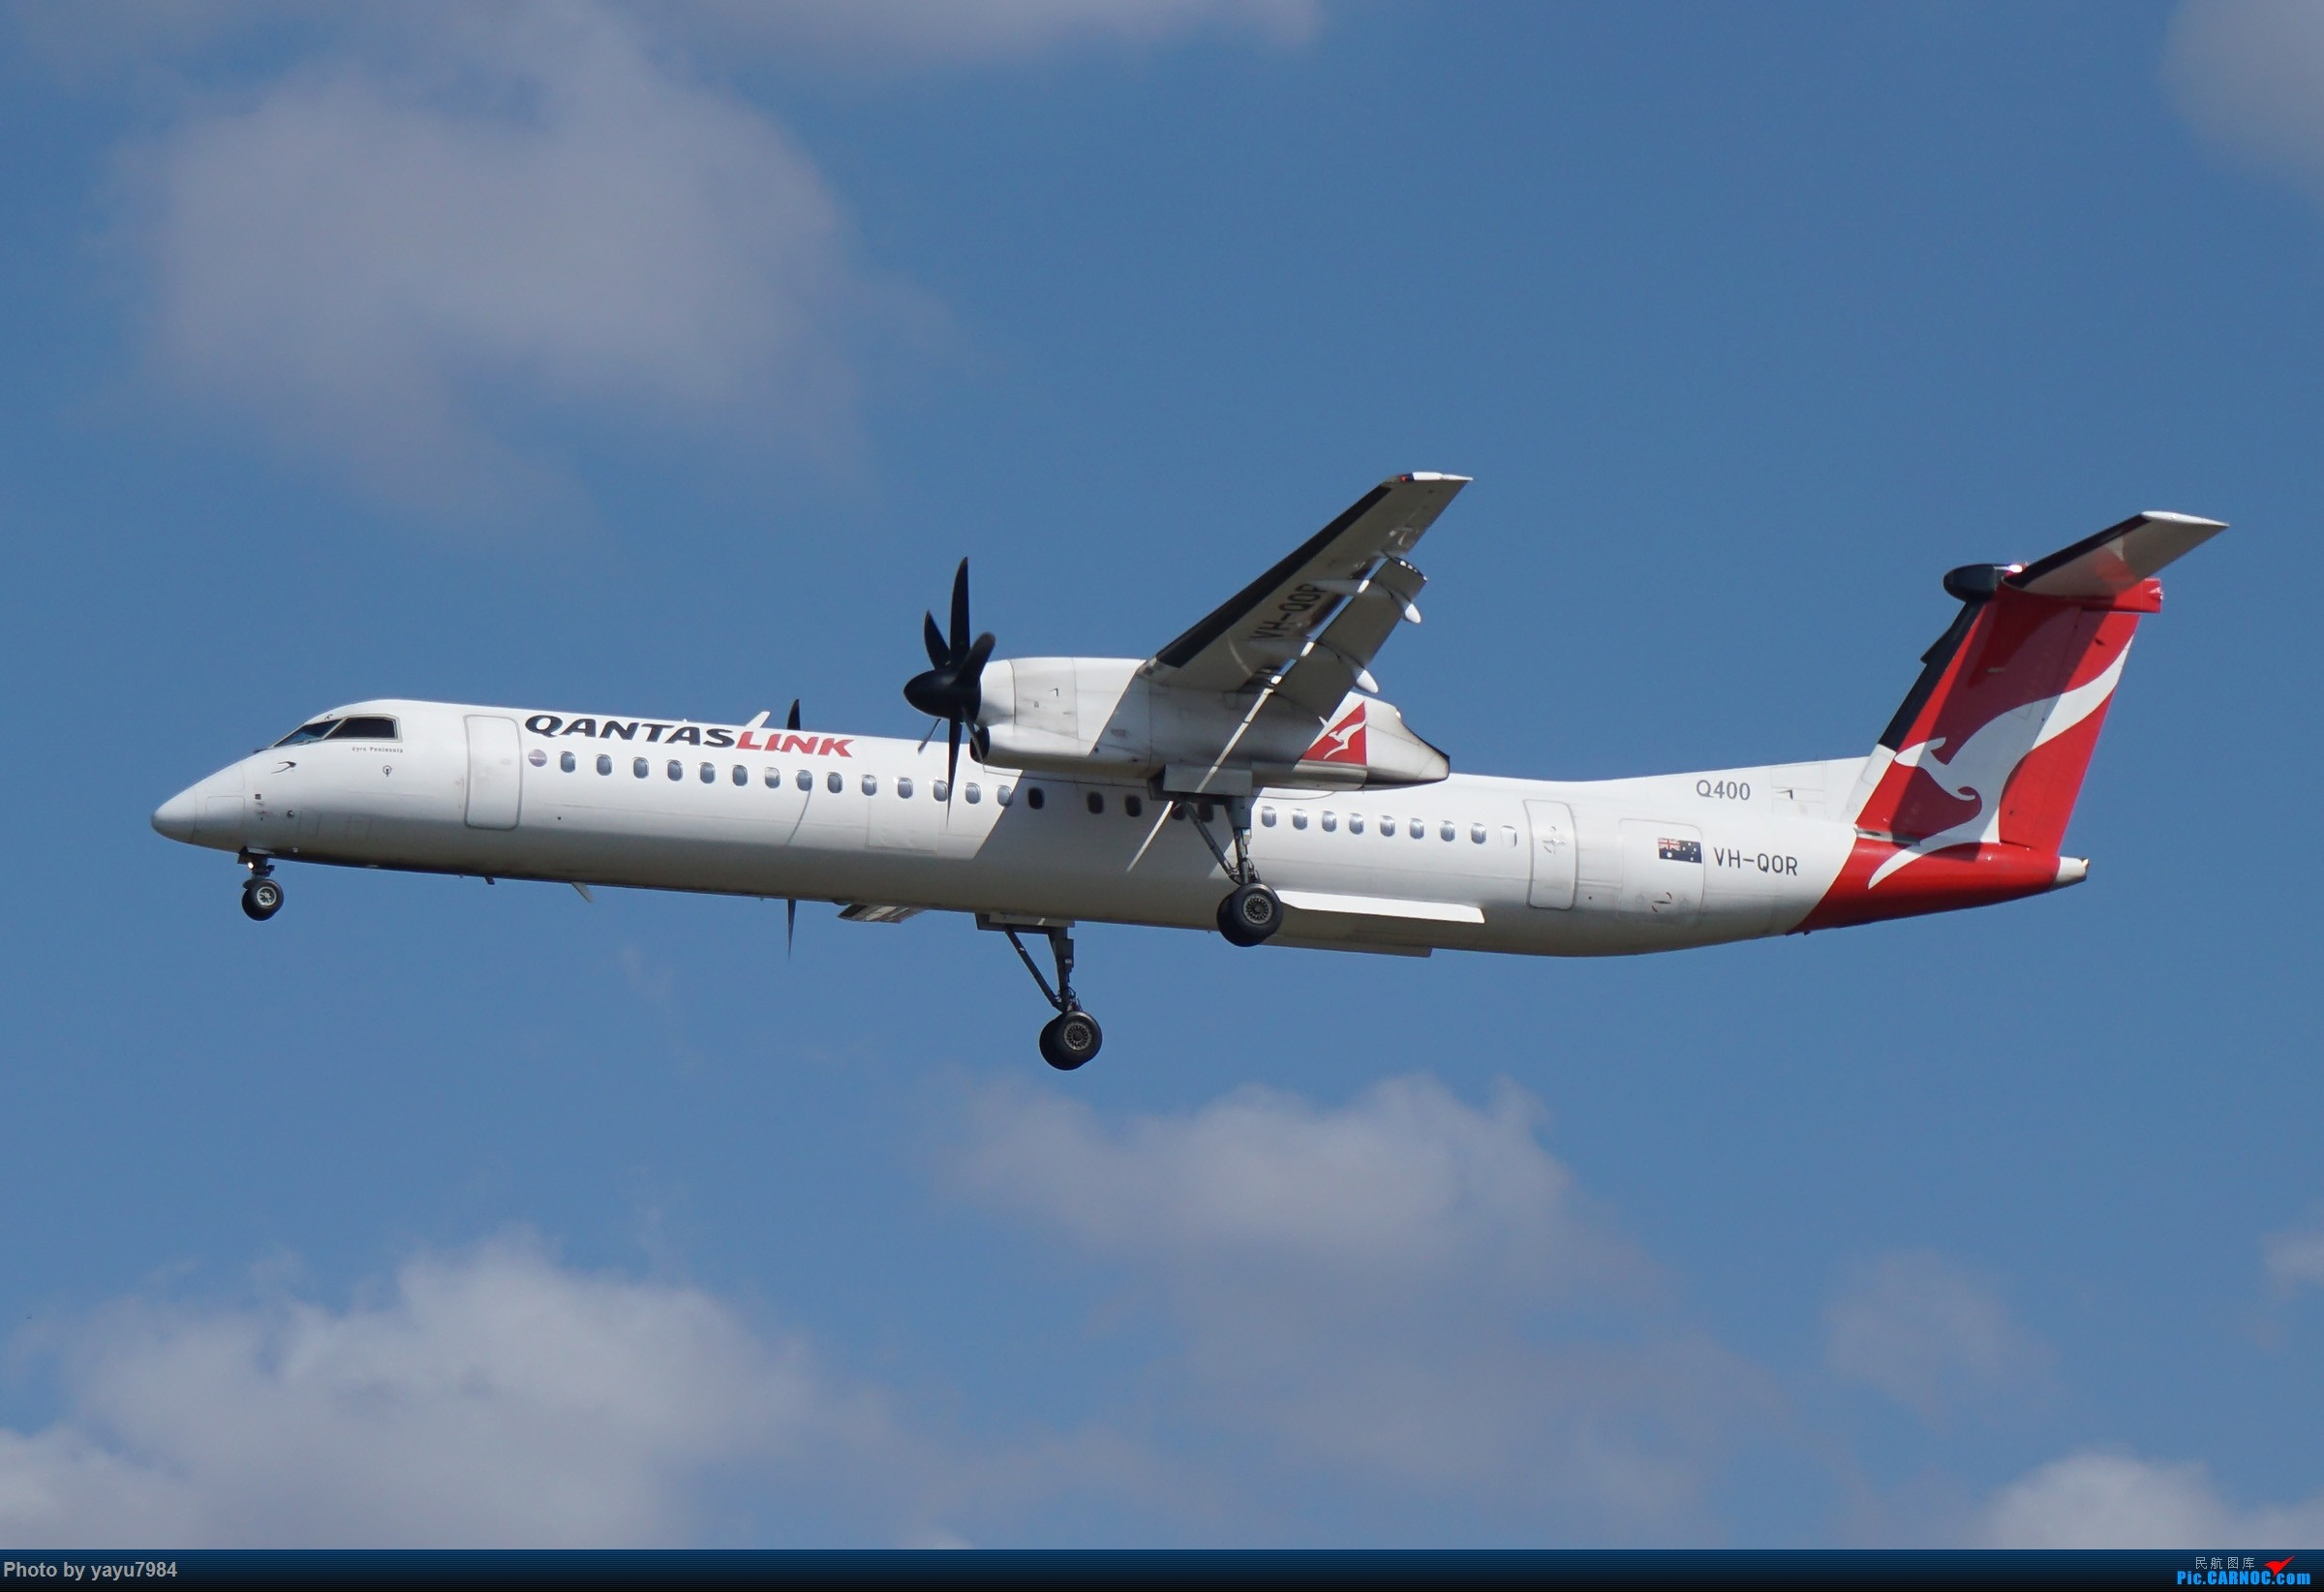 Re:[原创][SYD] 东航天合332,雪绒花343,华航蓝鹊,以及其他日常货 DE HAVILLAND CANADA DHC-8-400 VH-QOR 澳大利亚悉尼金斯福德·史密斯机场